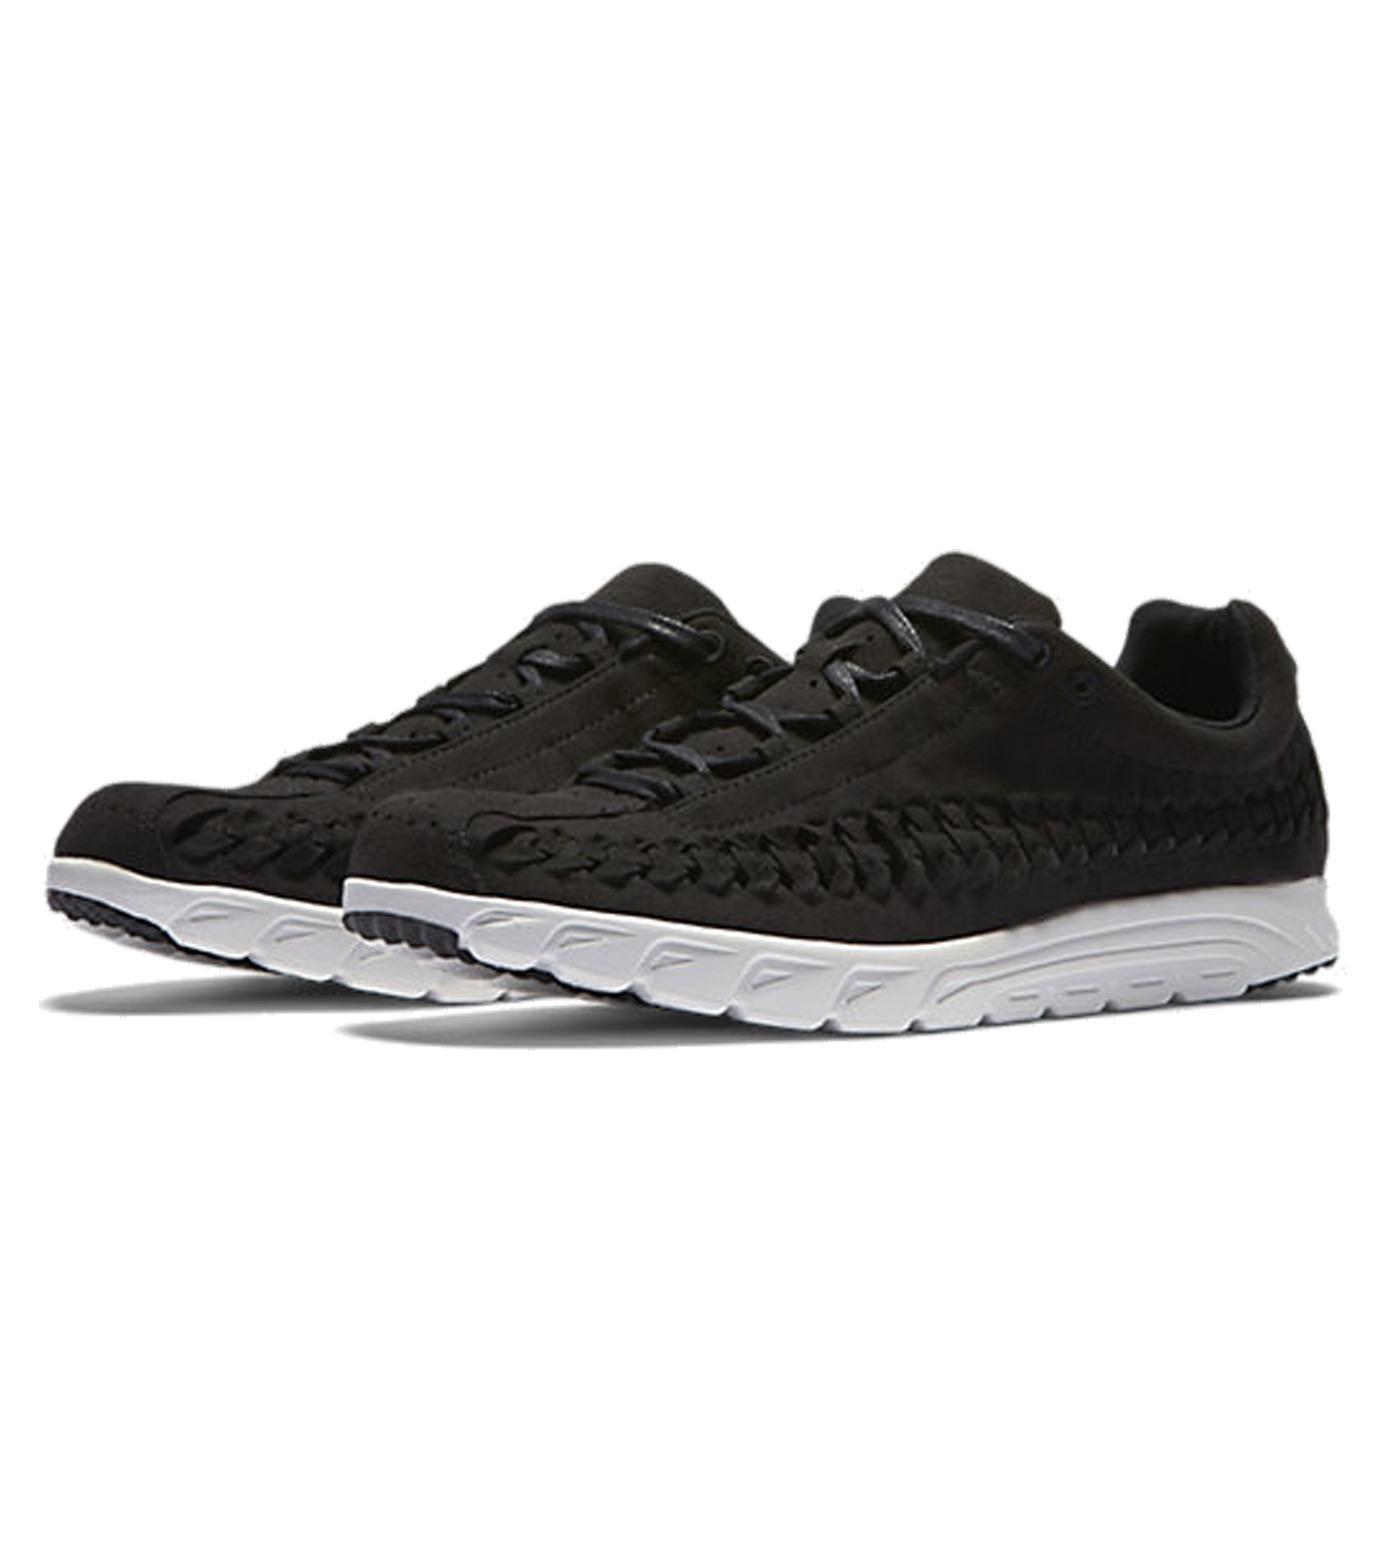 NIKE(ナイキ)のMAYFLY WOVEN-BLACK(シューズ/shoes)-833132-001-13 拡大詳細画像2